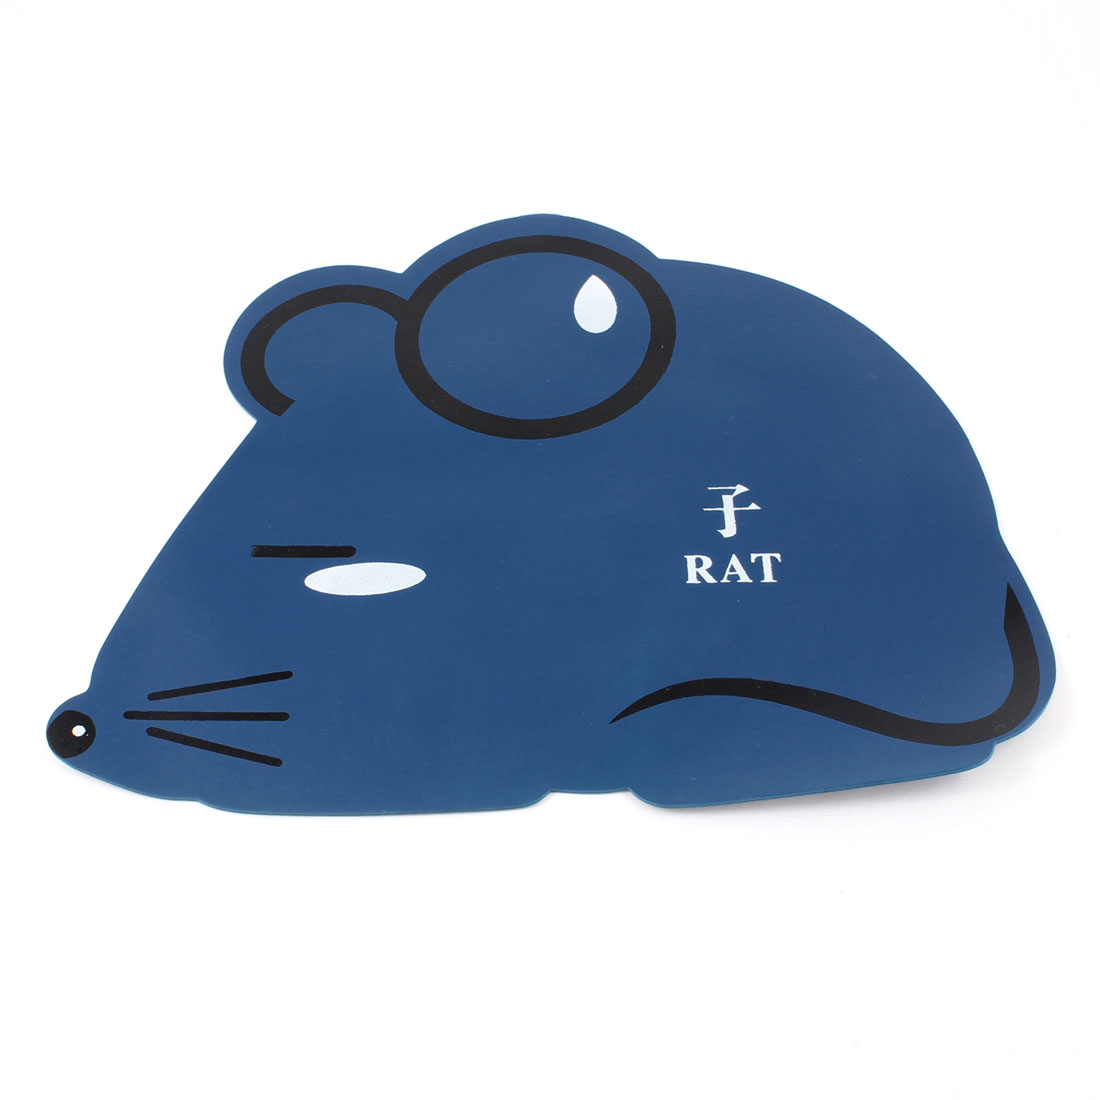 Desktop Chinese Zodiac Cartoon Rat Design Rubber Mouse Pad Mat Black Dark Blue